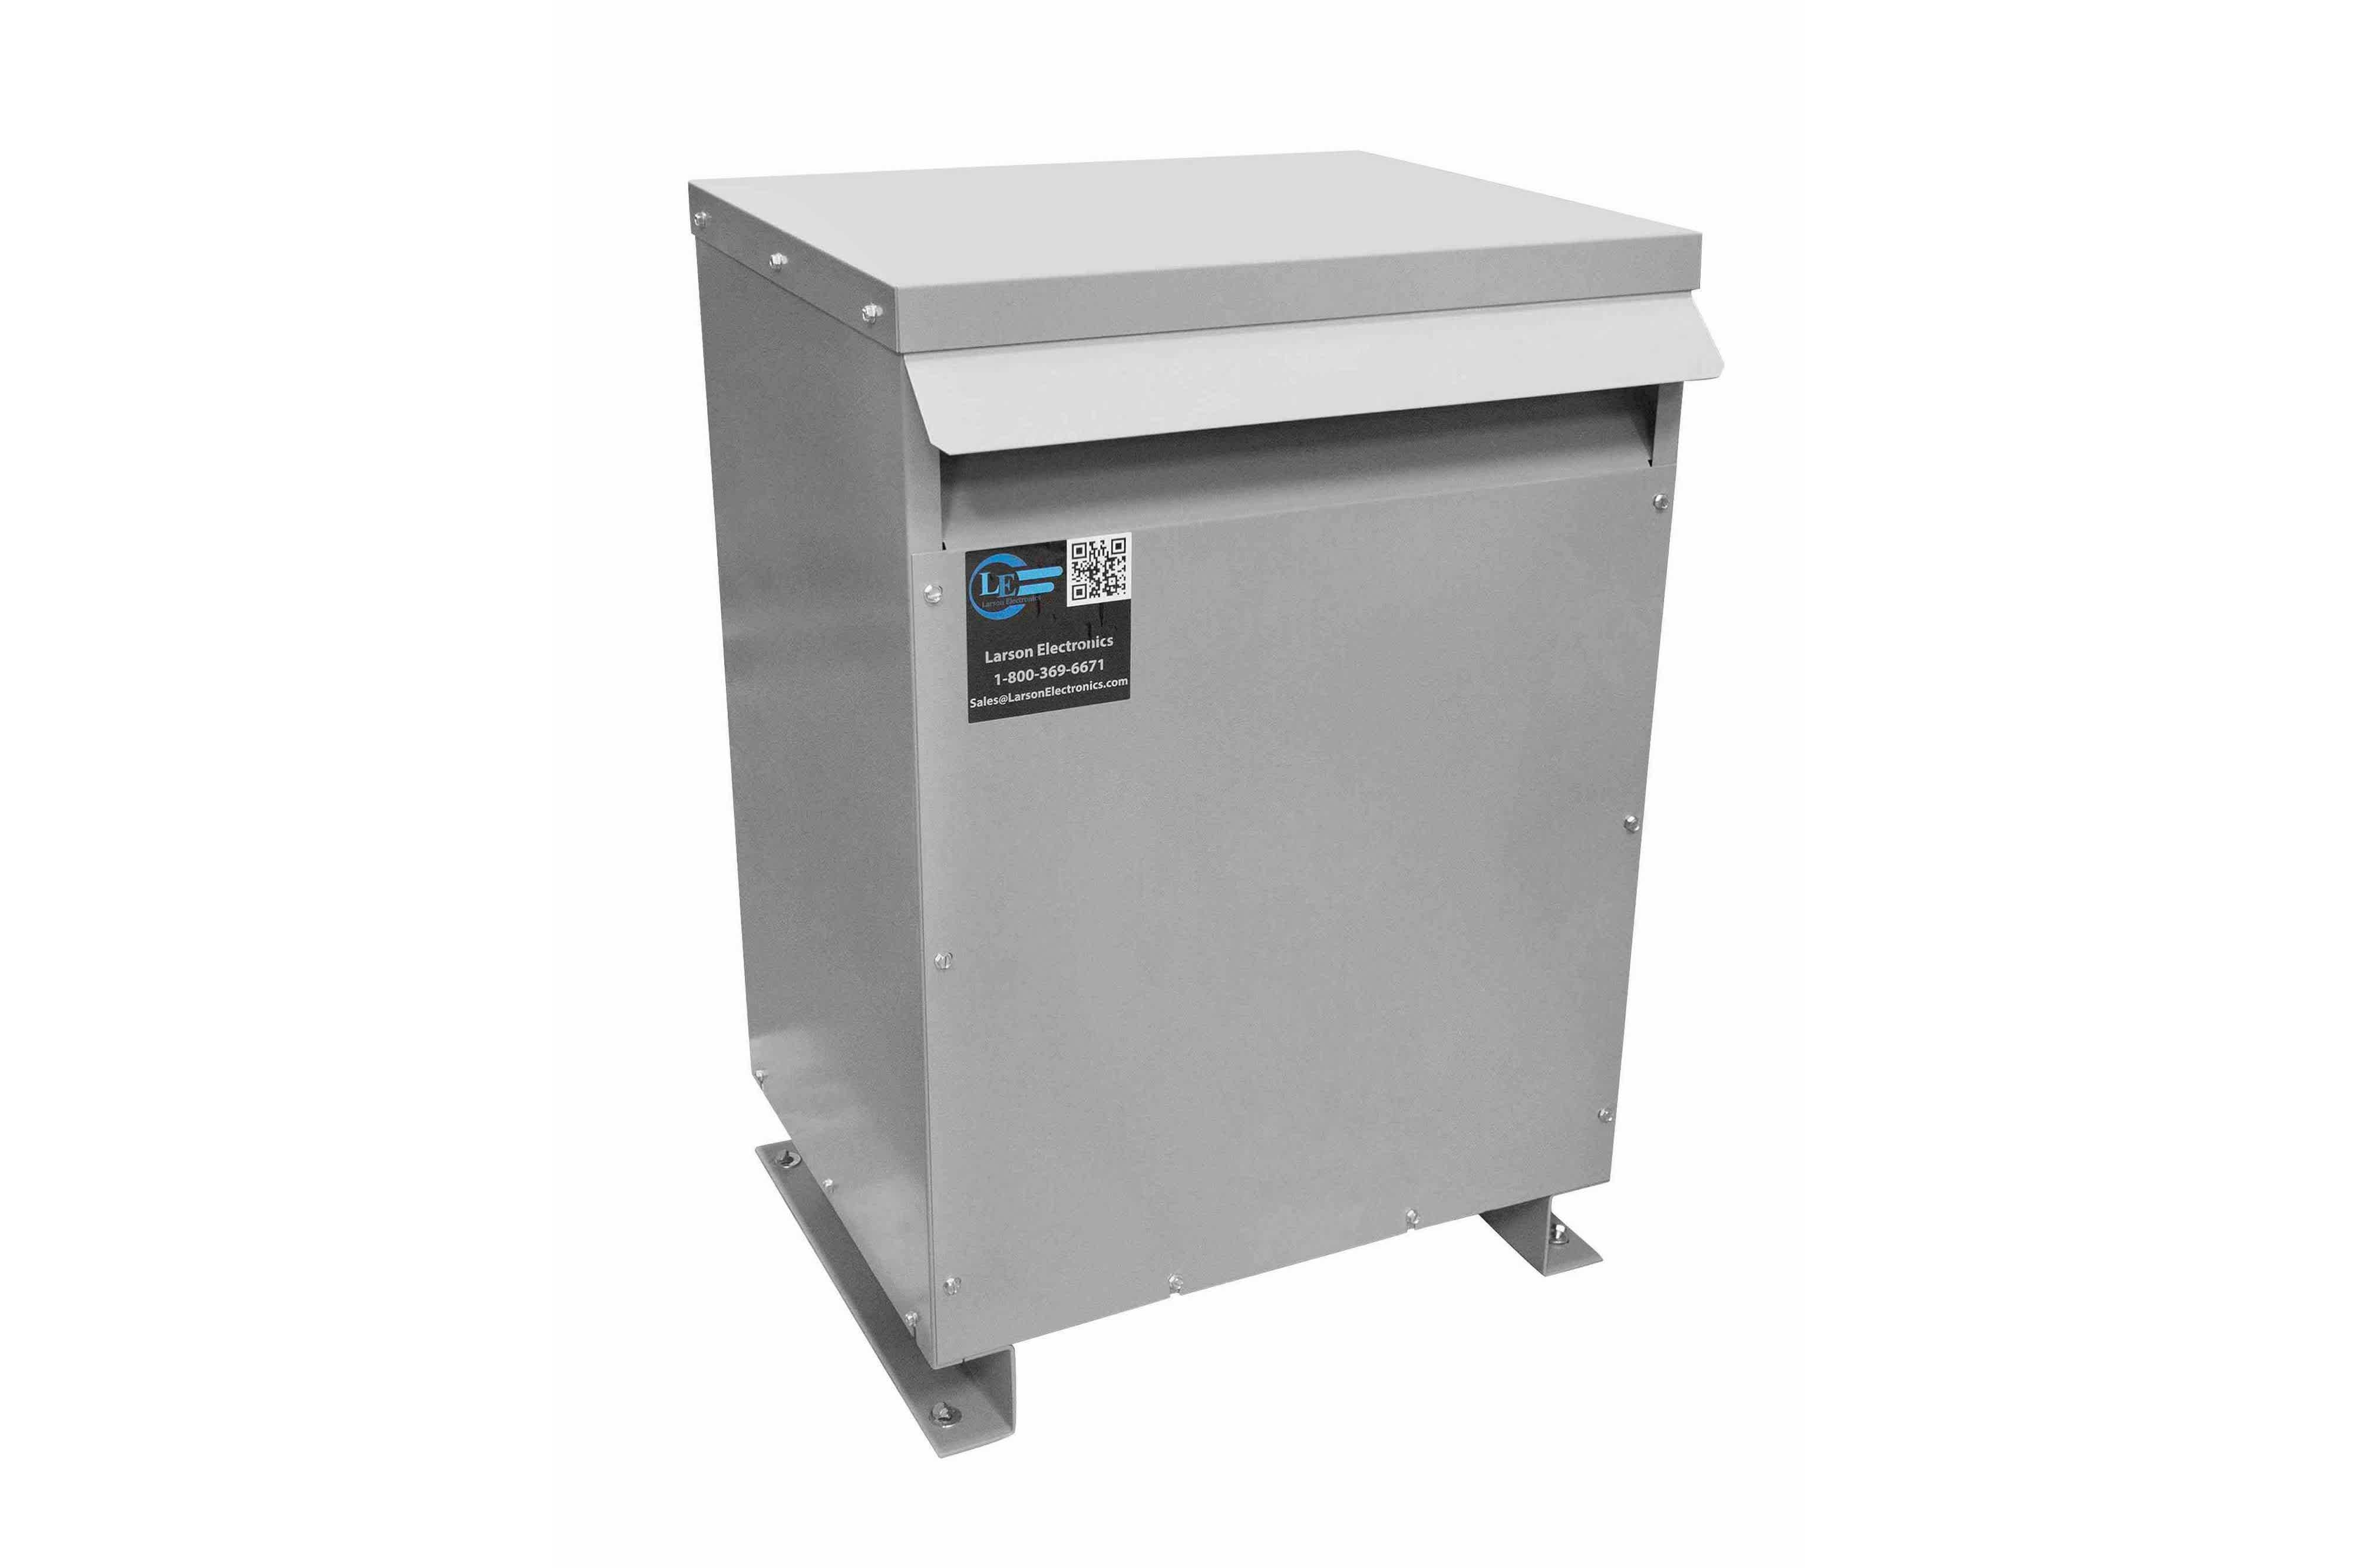 100 kVA 3PH Isolation Transformer, 240V Wye Primary, 380V Delta Secondary, N3R, Ventilated, 60 Hz